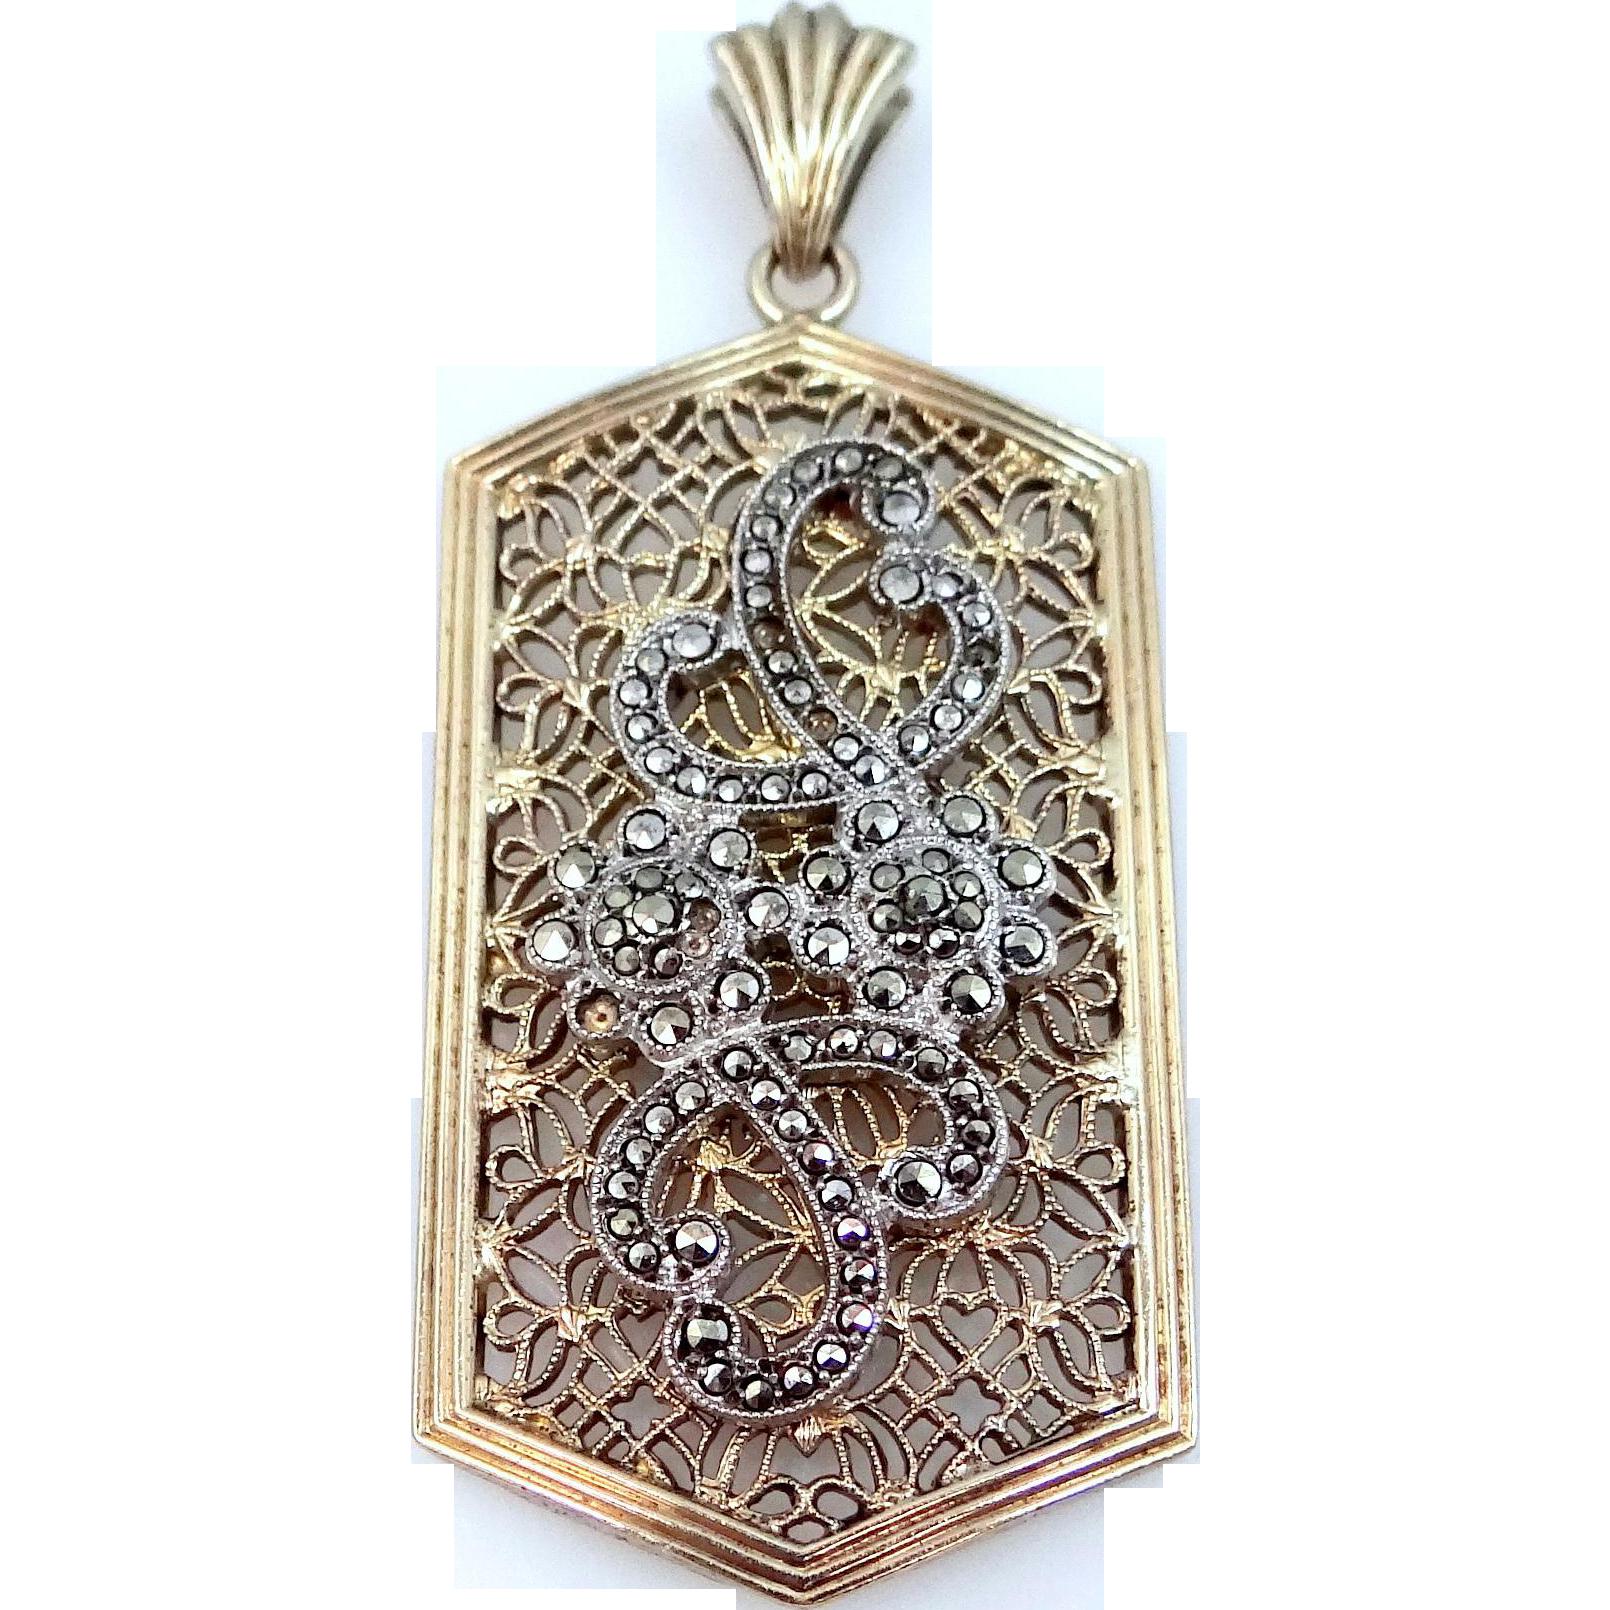 Symmetalic Sterling Silver and 12k Gold Marcasite Filigree Art Deco Pendant